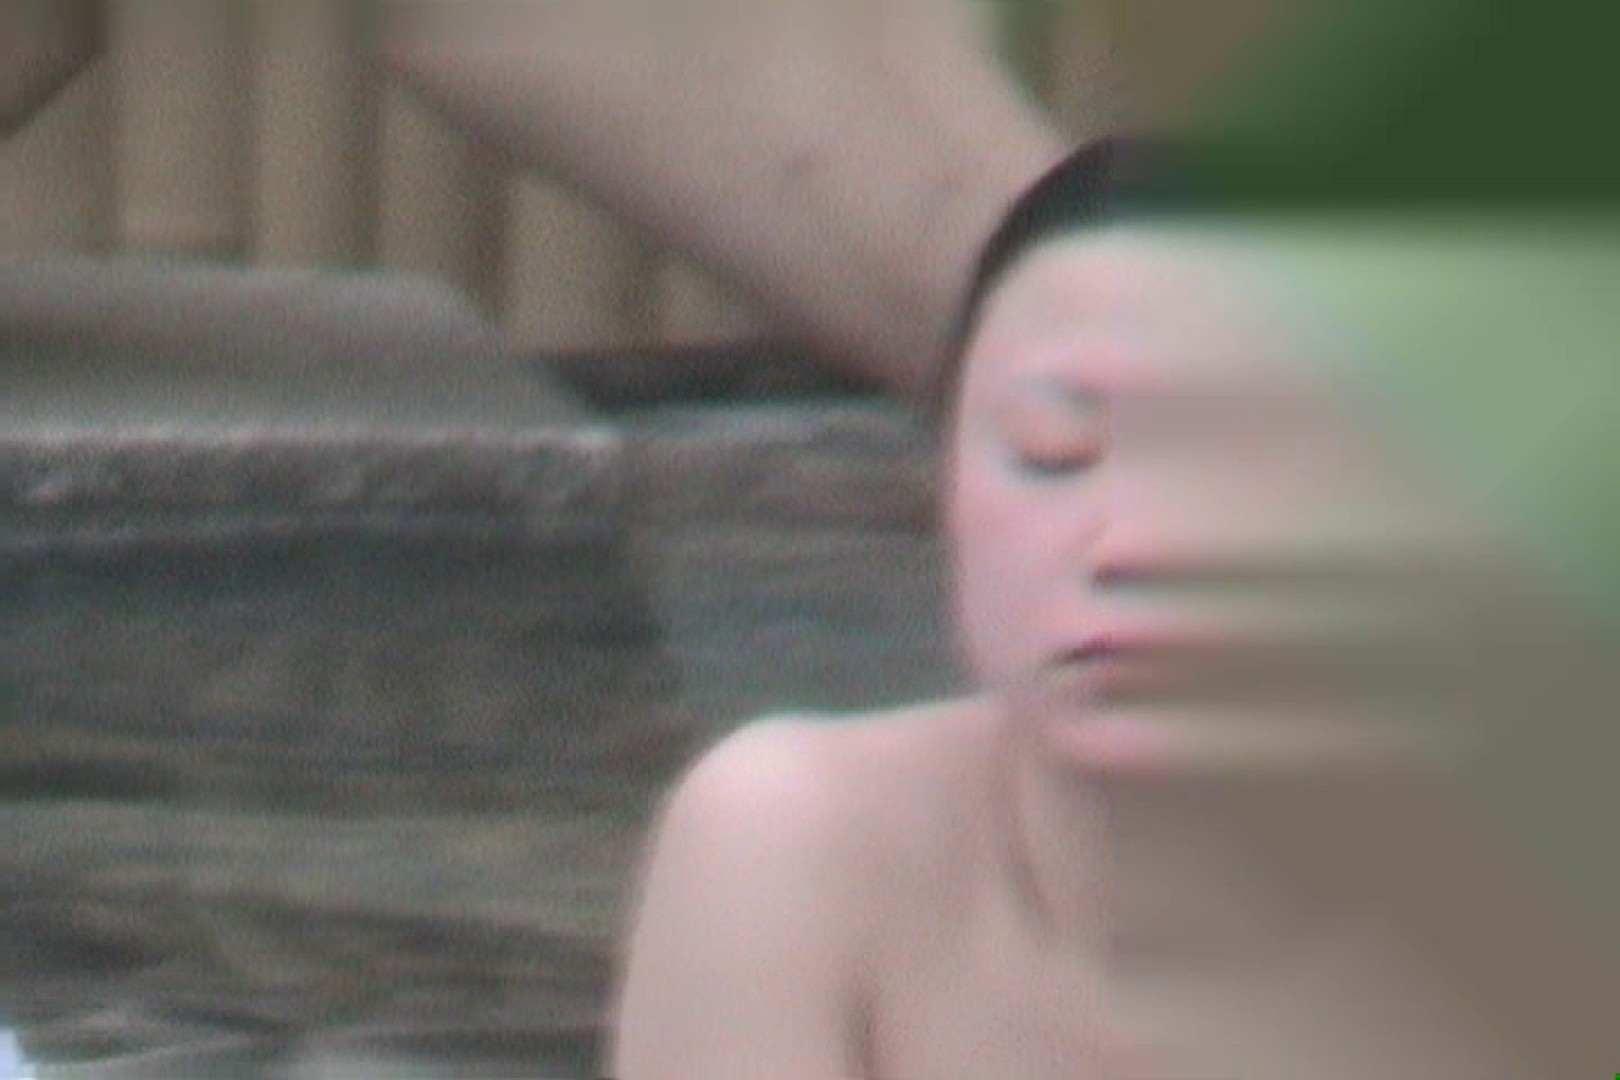 Aquaな露天風呂Vol.599 盗撮シリーズ   露天風呂編  93PIX 73